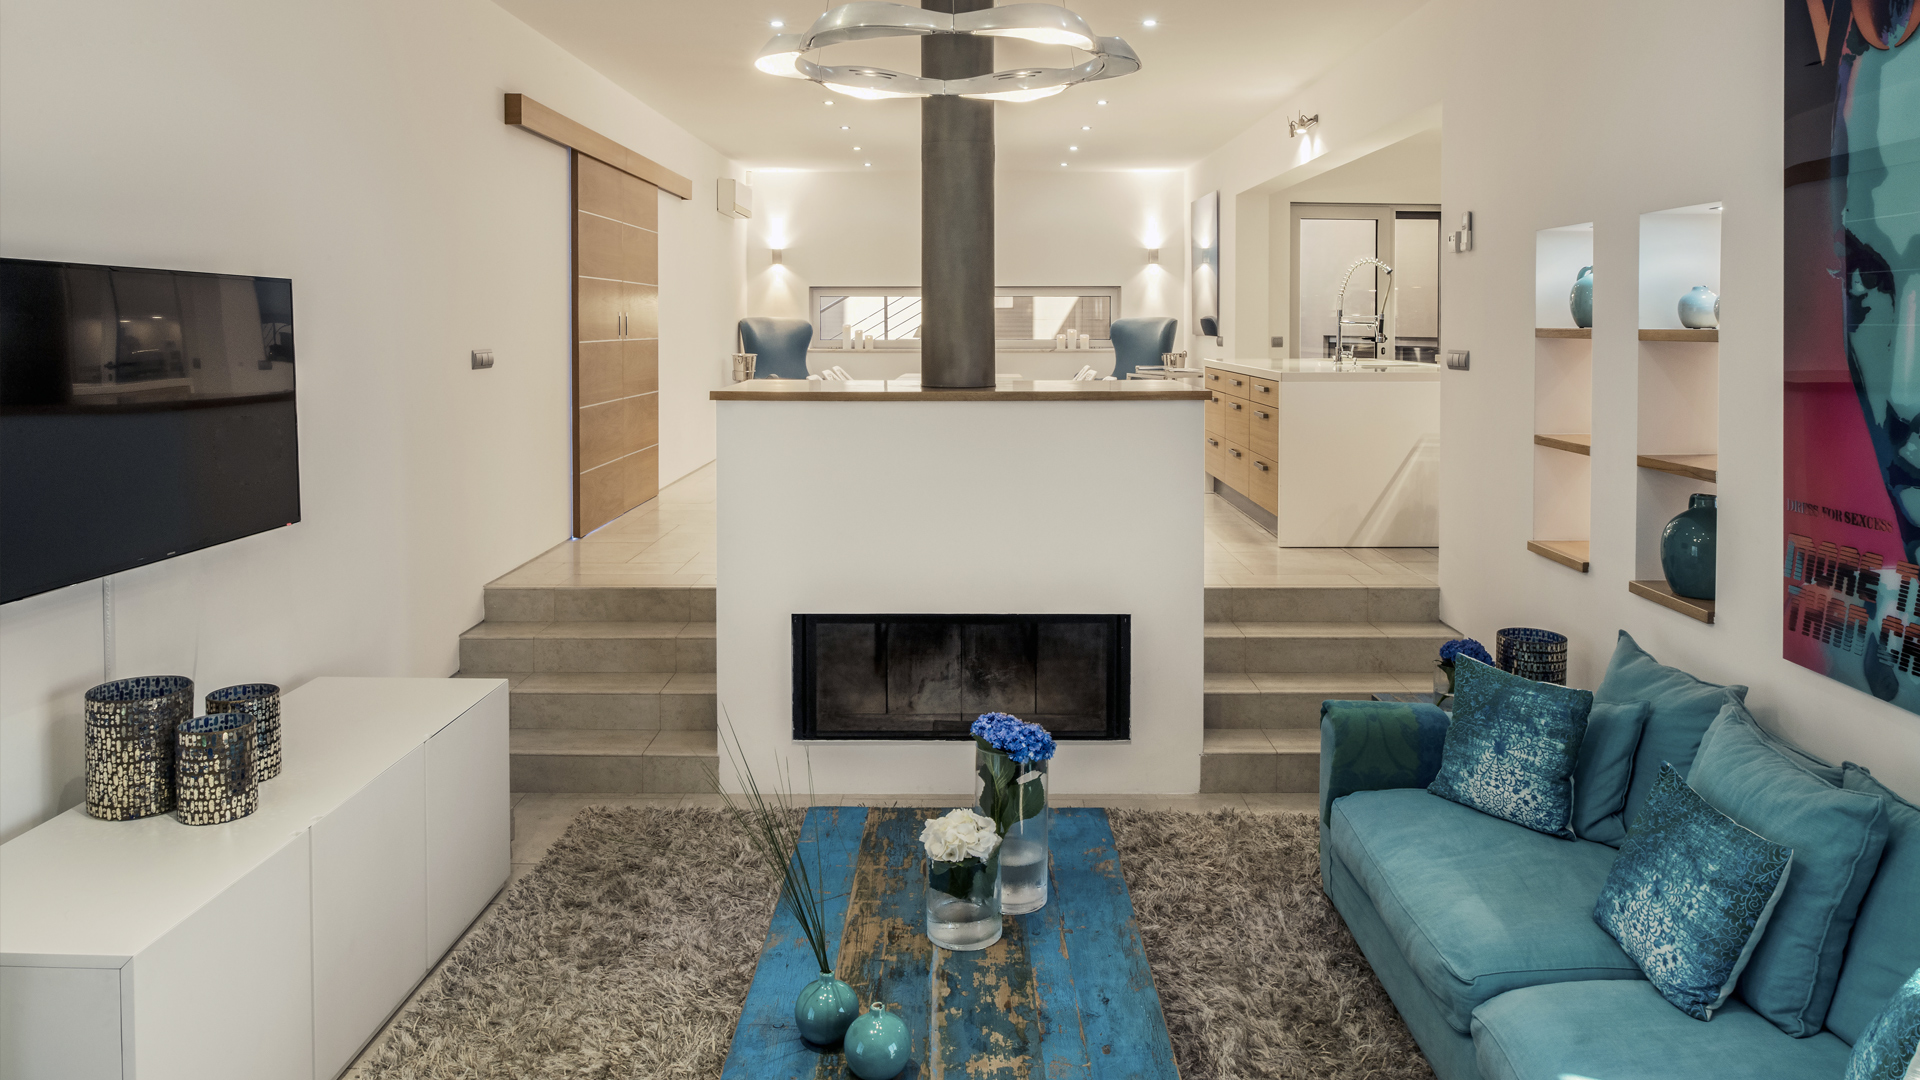 Villa Mar Azul - living room and kitchen